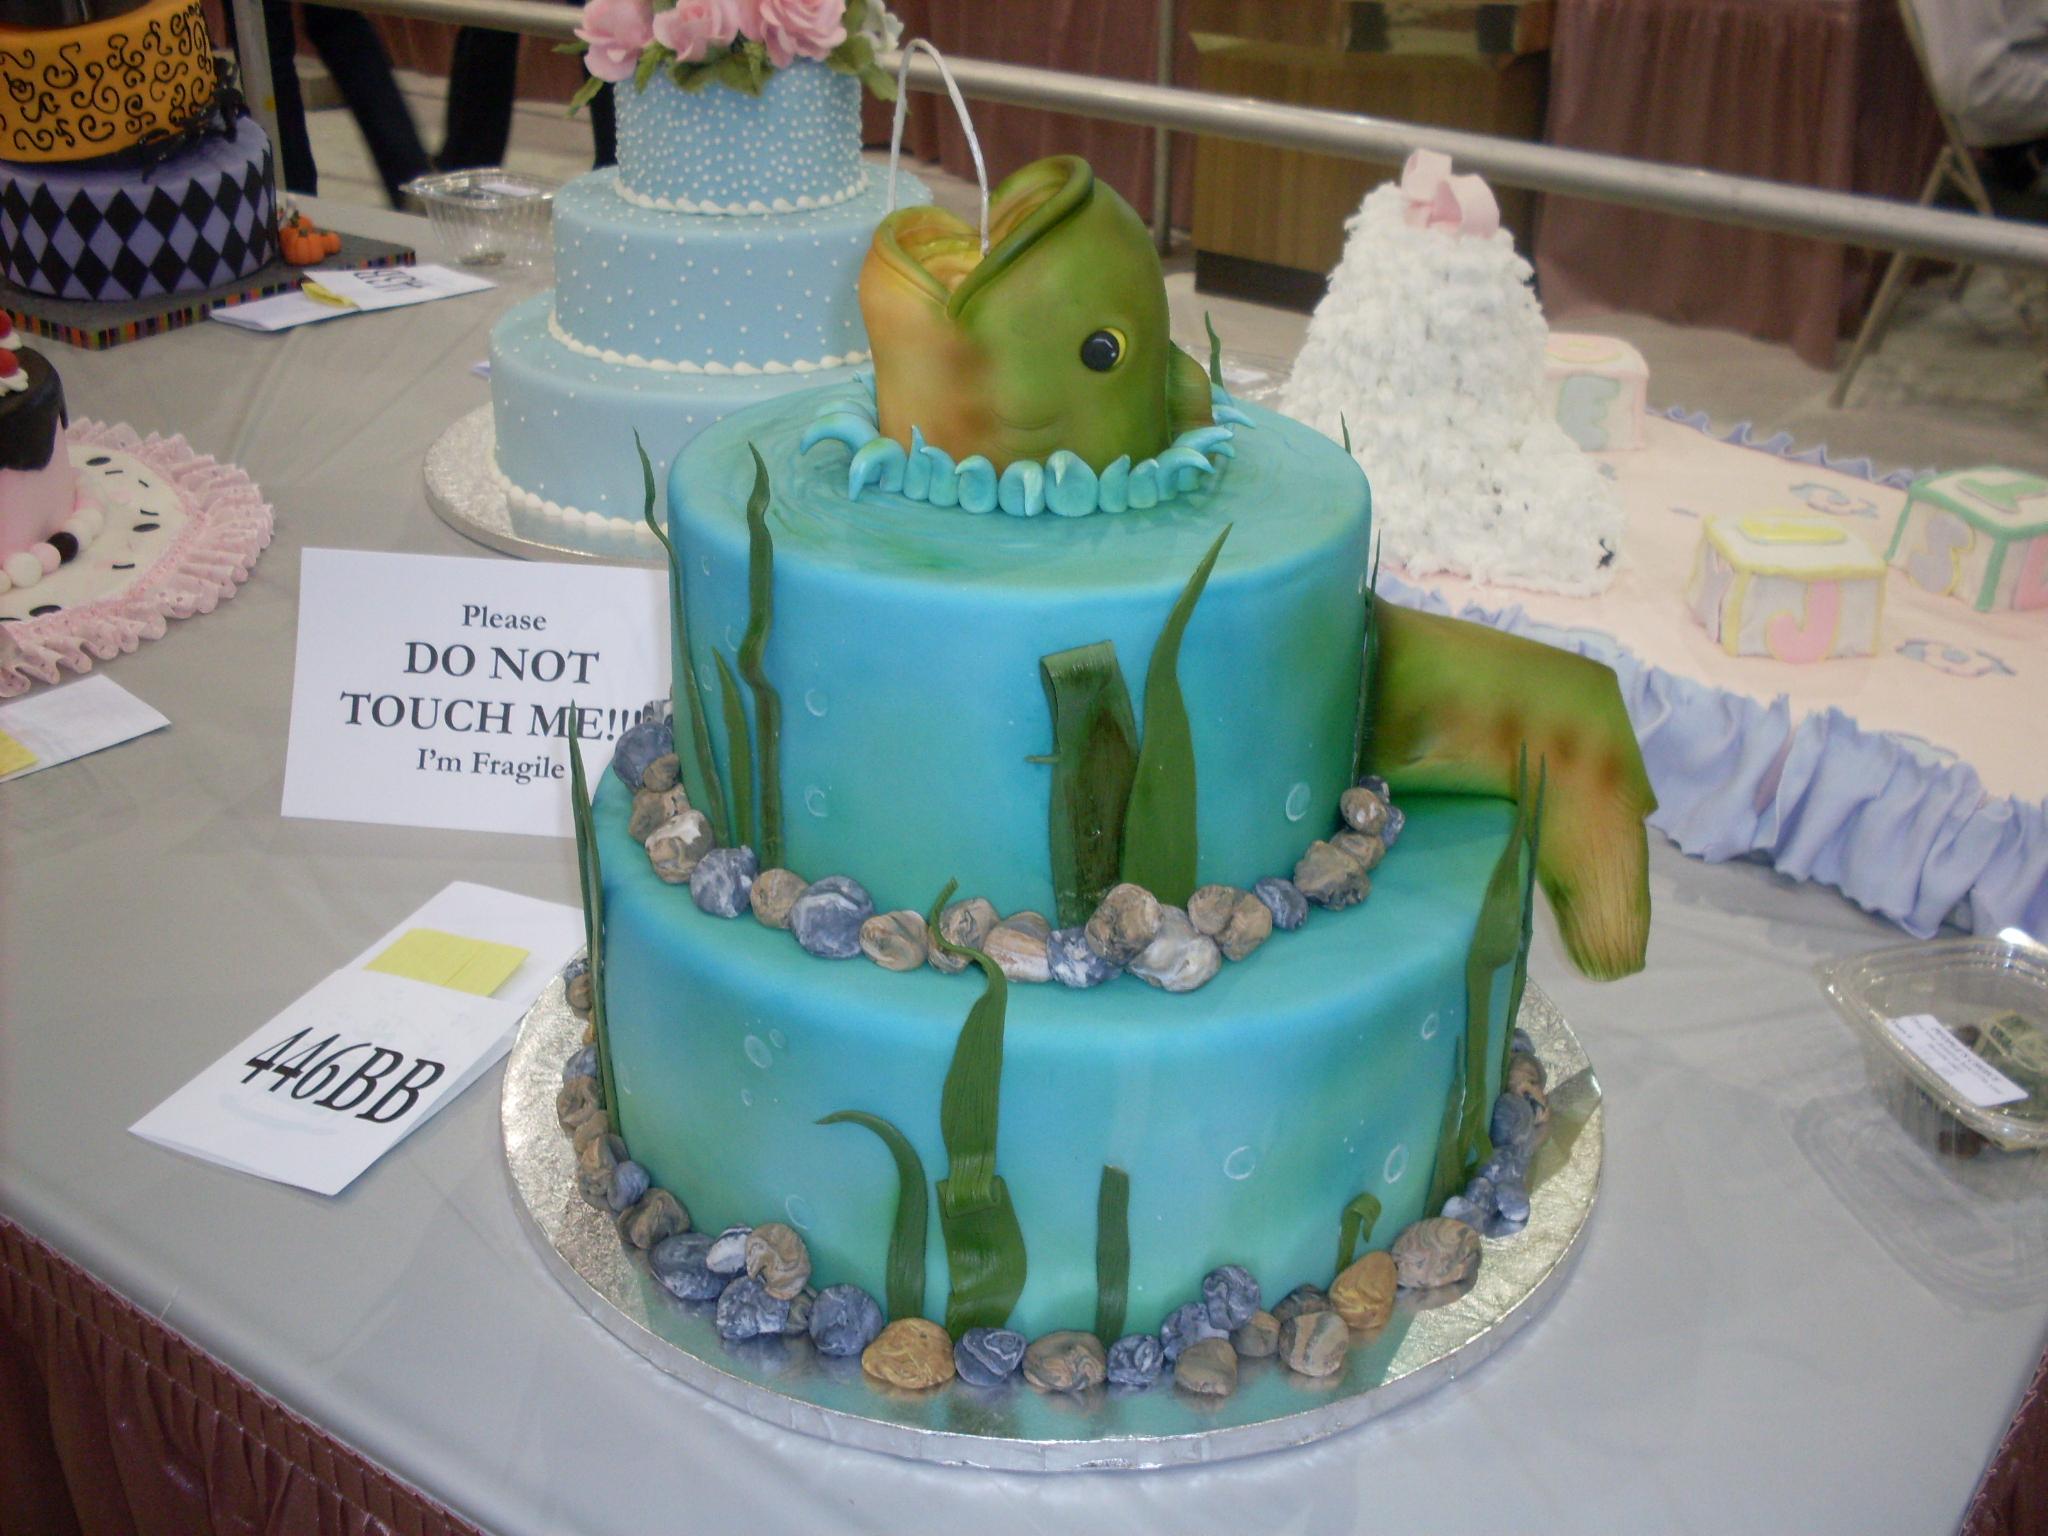 This one strikes me as more groom's cake than wedding cake